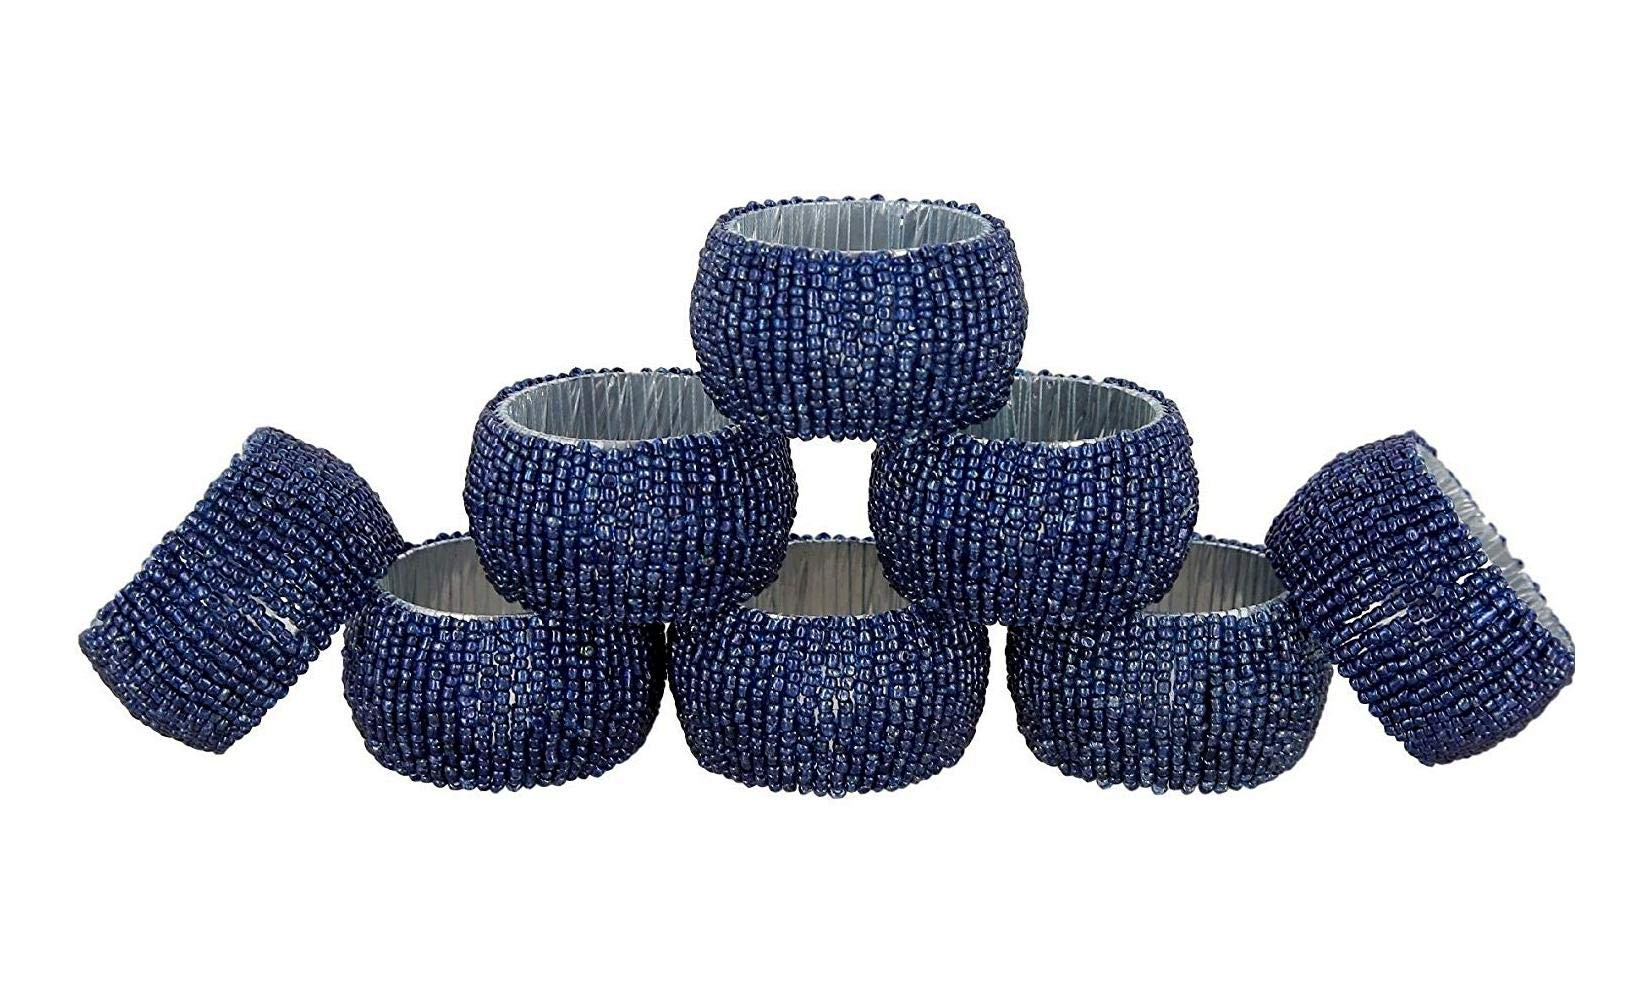 ShalinIndia Napkin Ring Pack of 8 Christmas Table Decoration Ideas - Glass Beaded Decorative Round Blue Textured Napkin Tissue Holder for Party